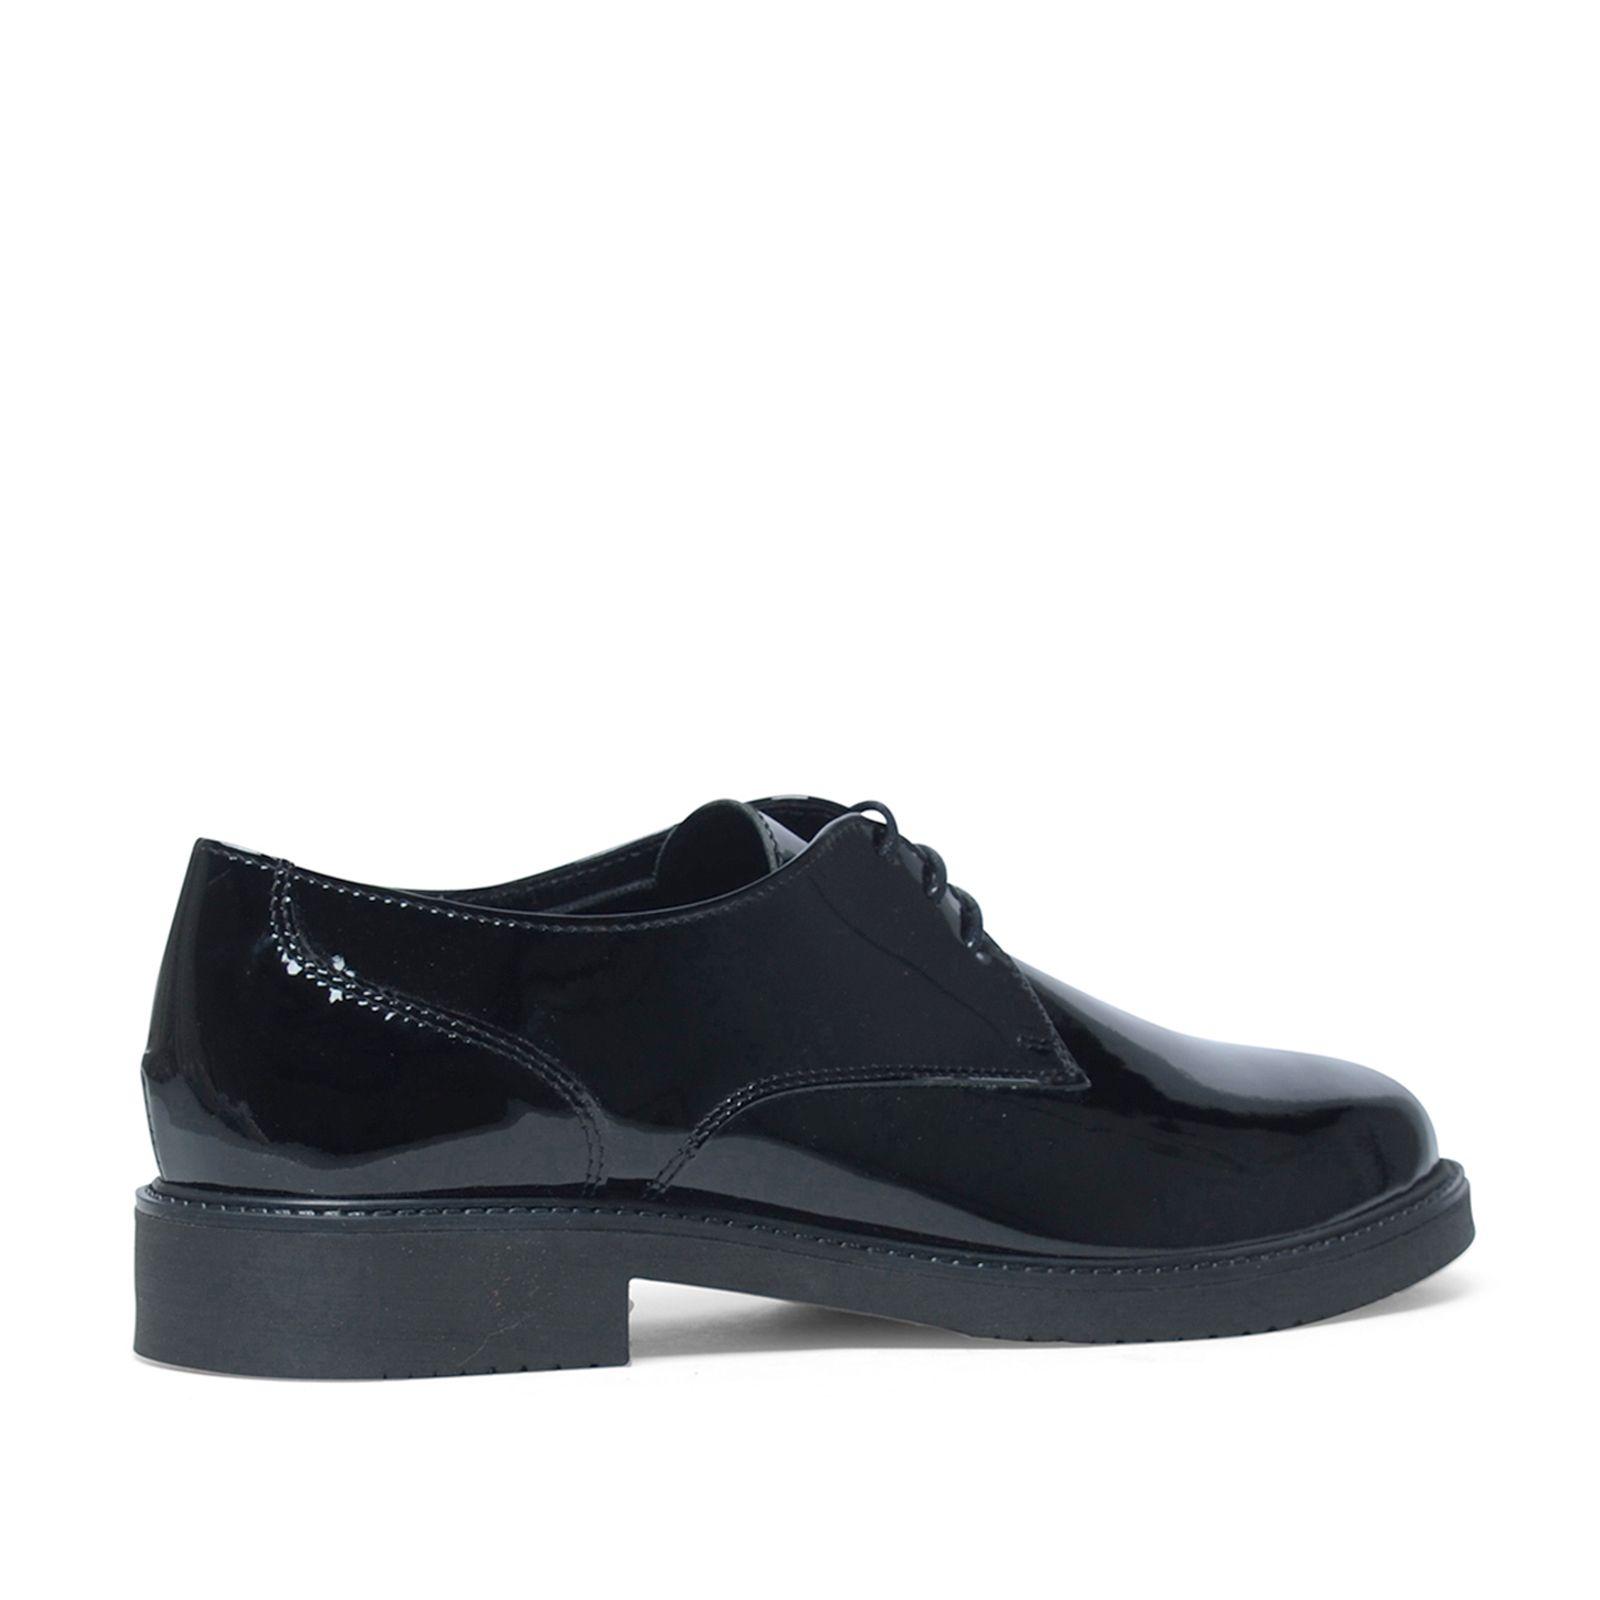 Zwarte veterschoenen lak damesschoenen - Meubilair zwarte keuken lak ...